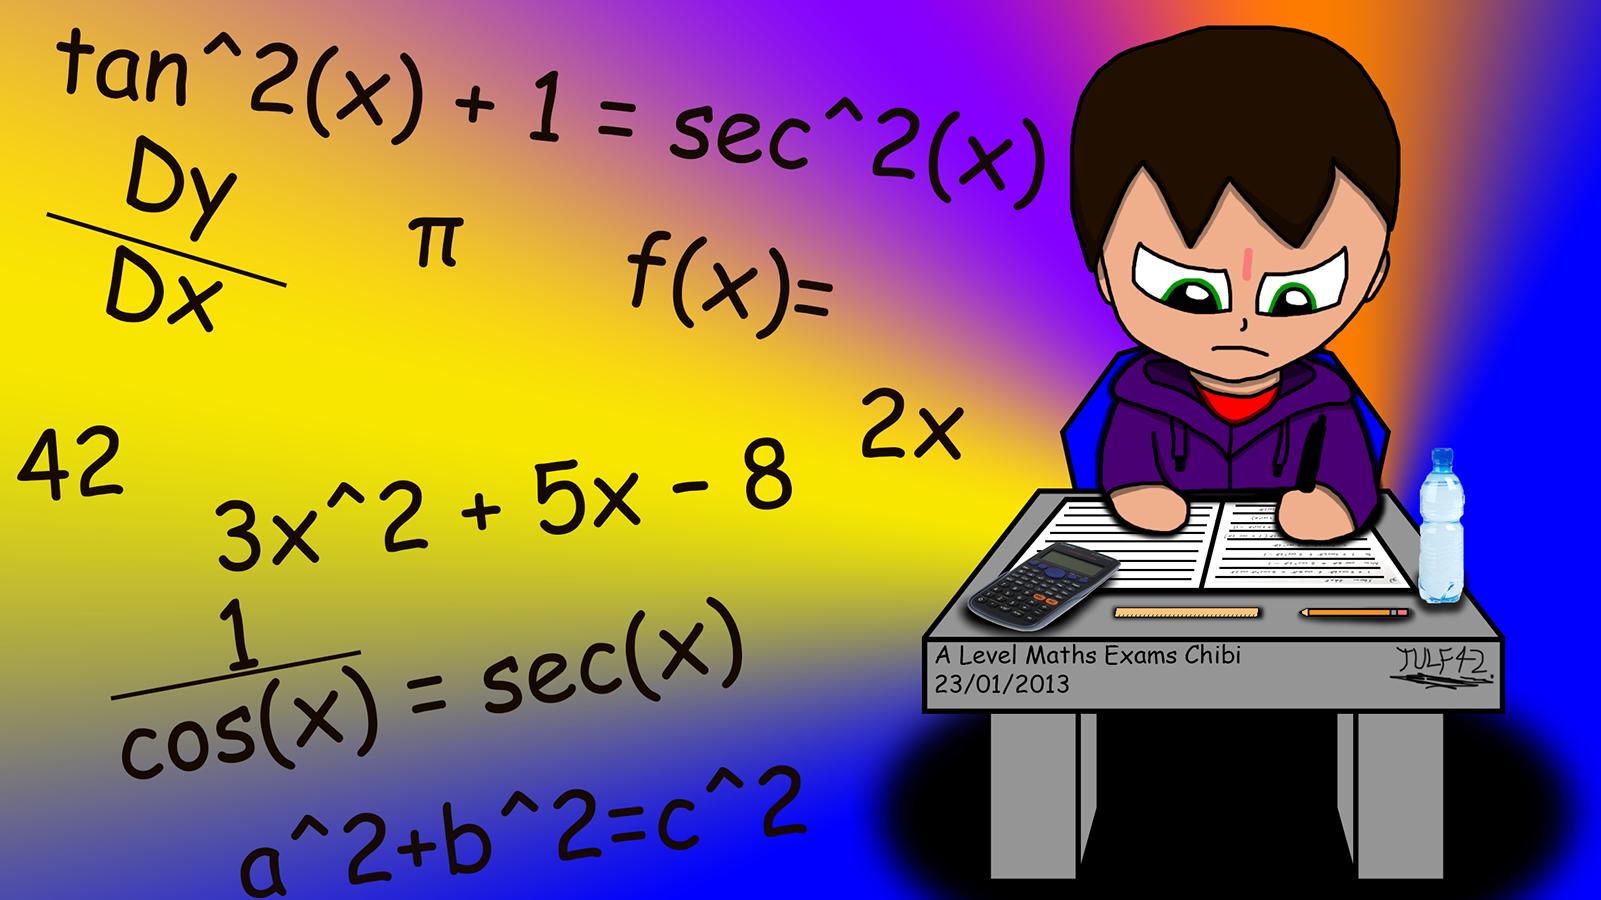 Wallpaper download exam -  A Level Maths Exam Chibi Wallpaper By Tulf42